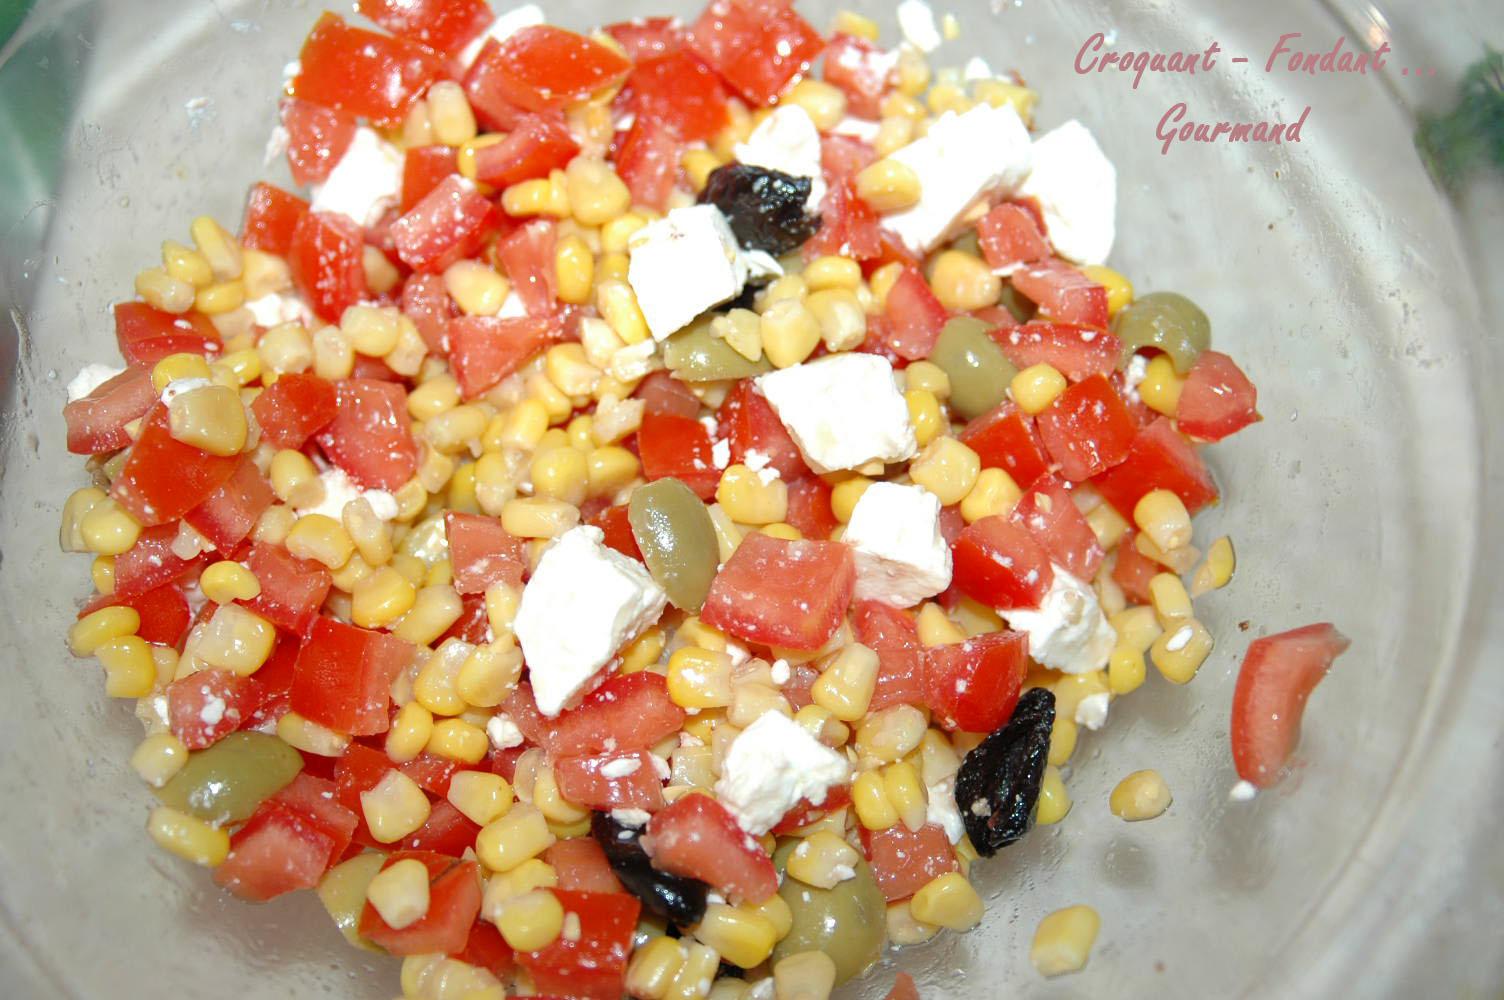 salade de ma 239 s dsc 2481 10642 croquant fondant gourmand